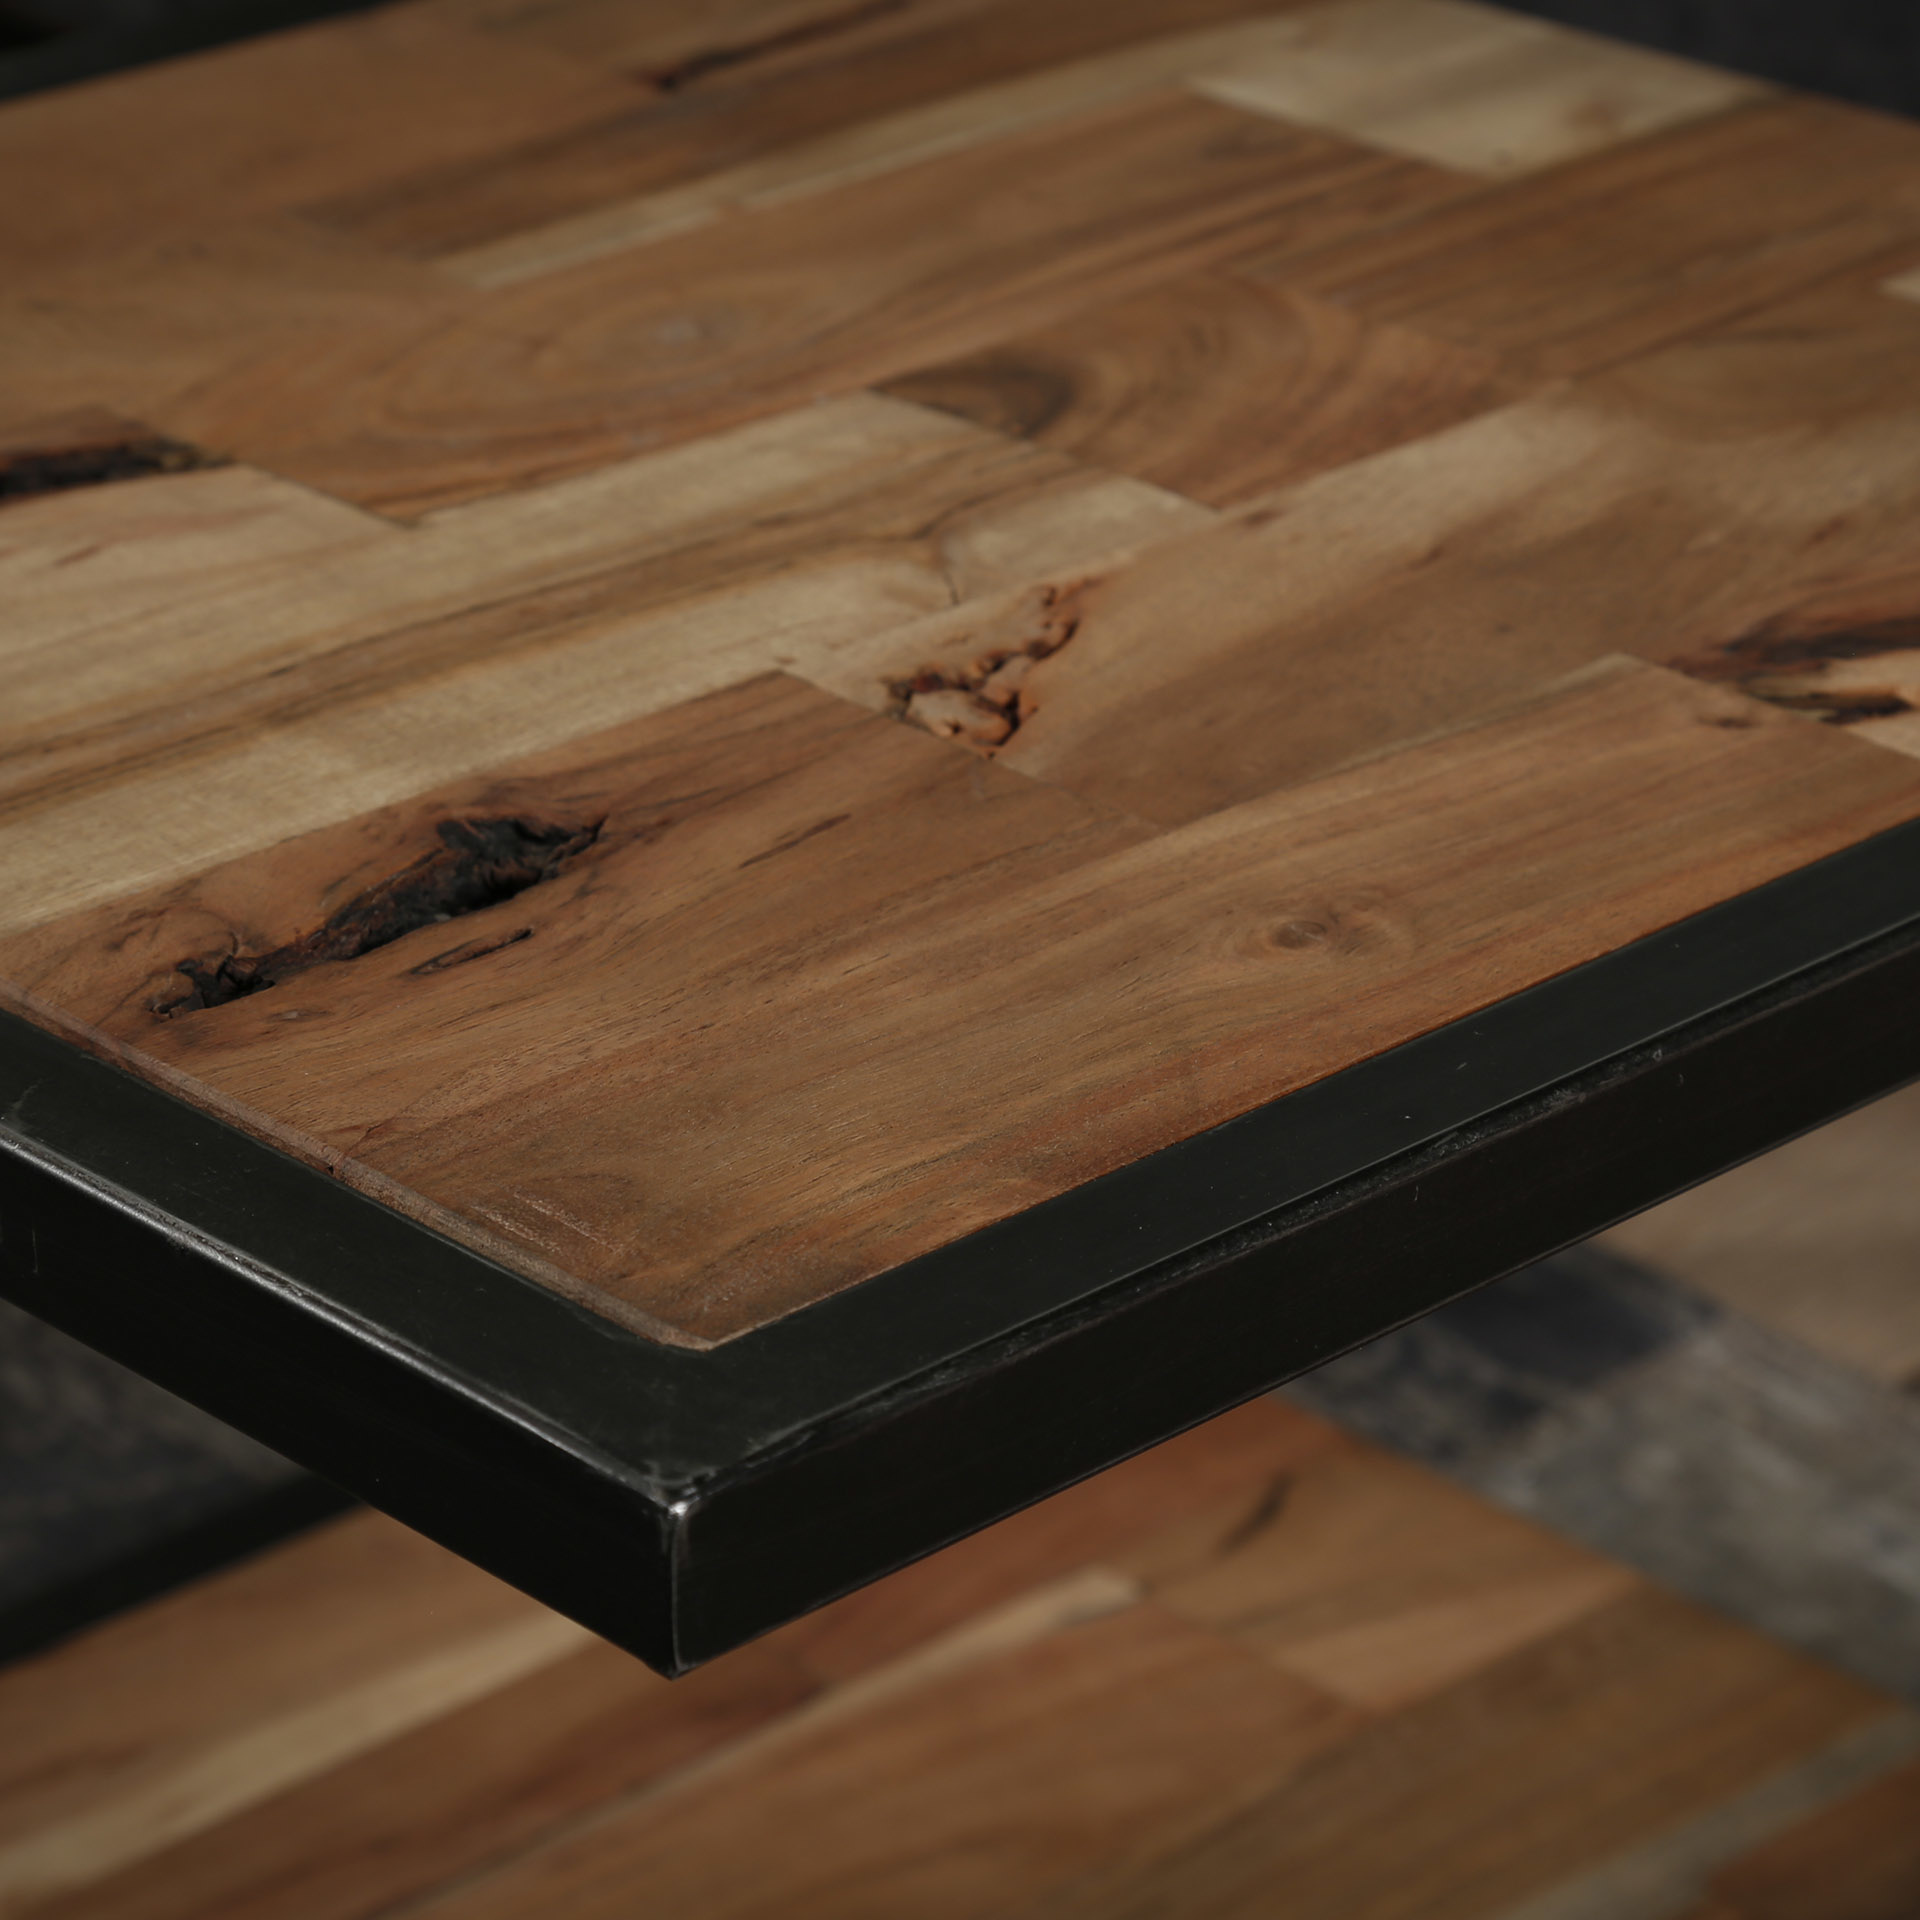 Duverger Industry Sandblast - Salontafel - 2 acacia bladen - gezandstraald - metalen frame - U-vorm - 50x50cm